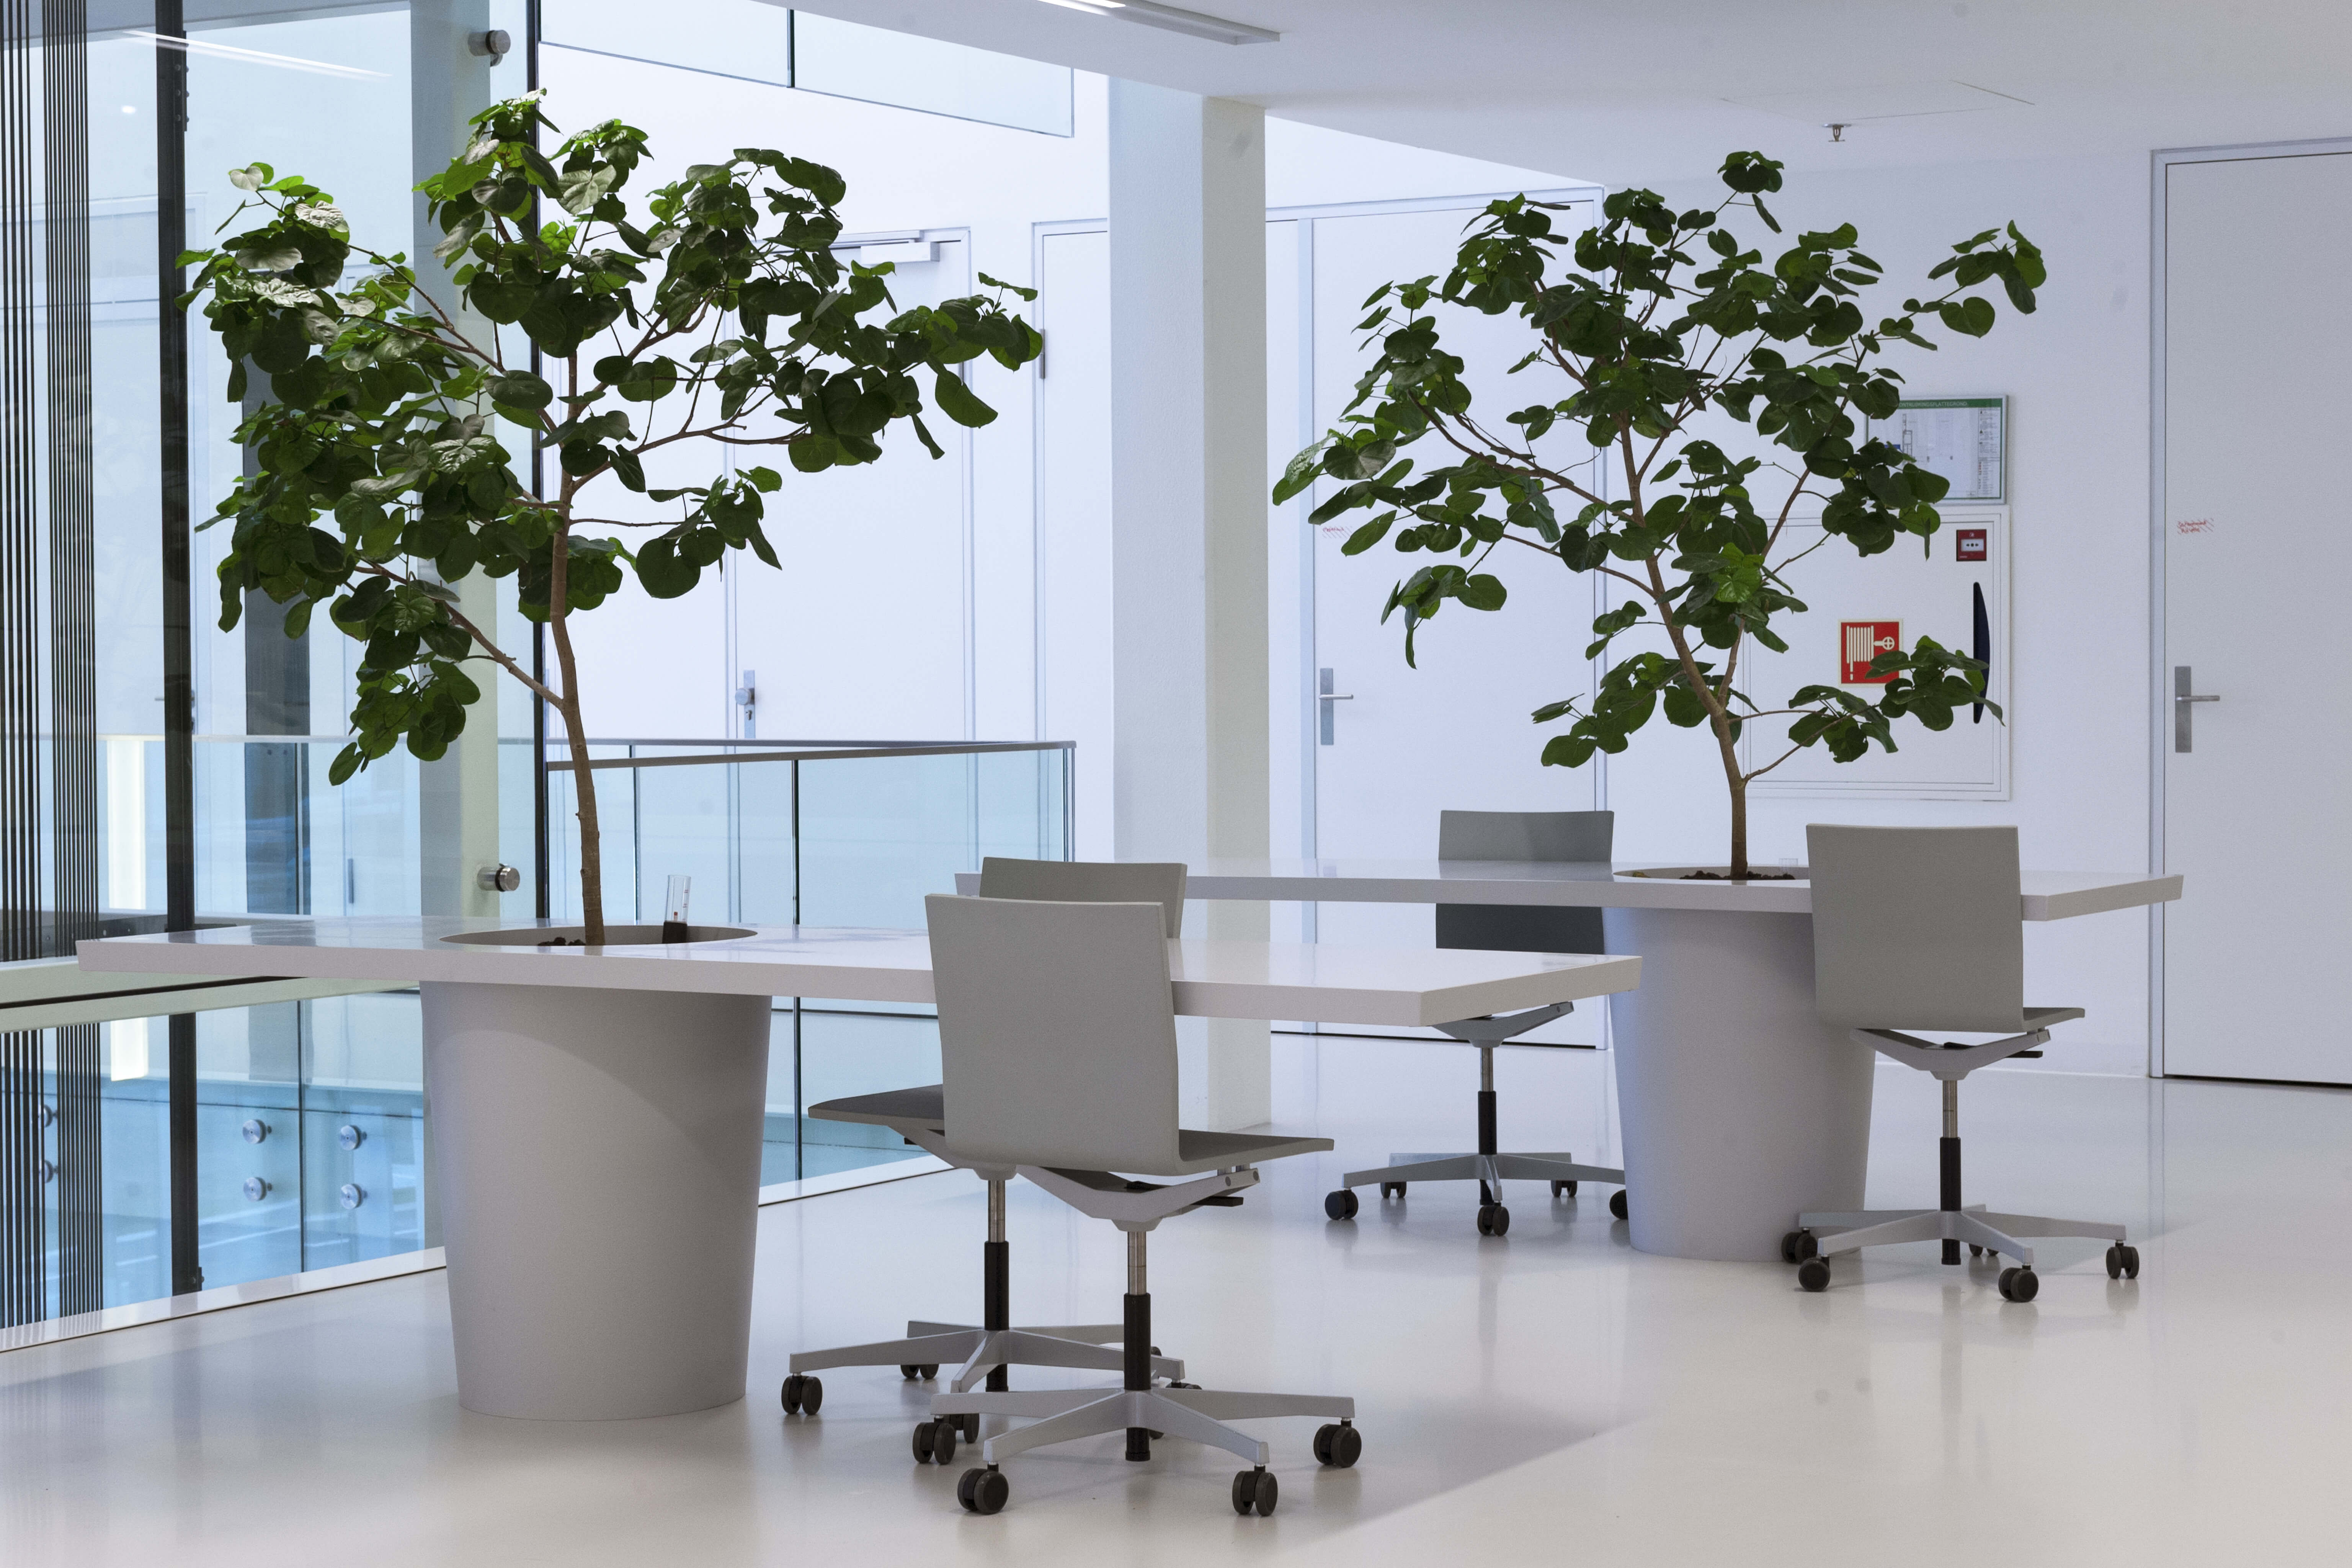 Project interieurbeplanting koninklijke ginkel groep for Interieur beplanting